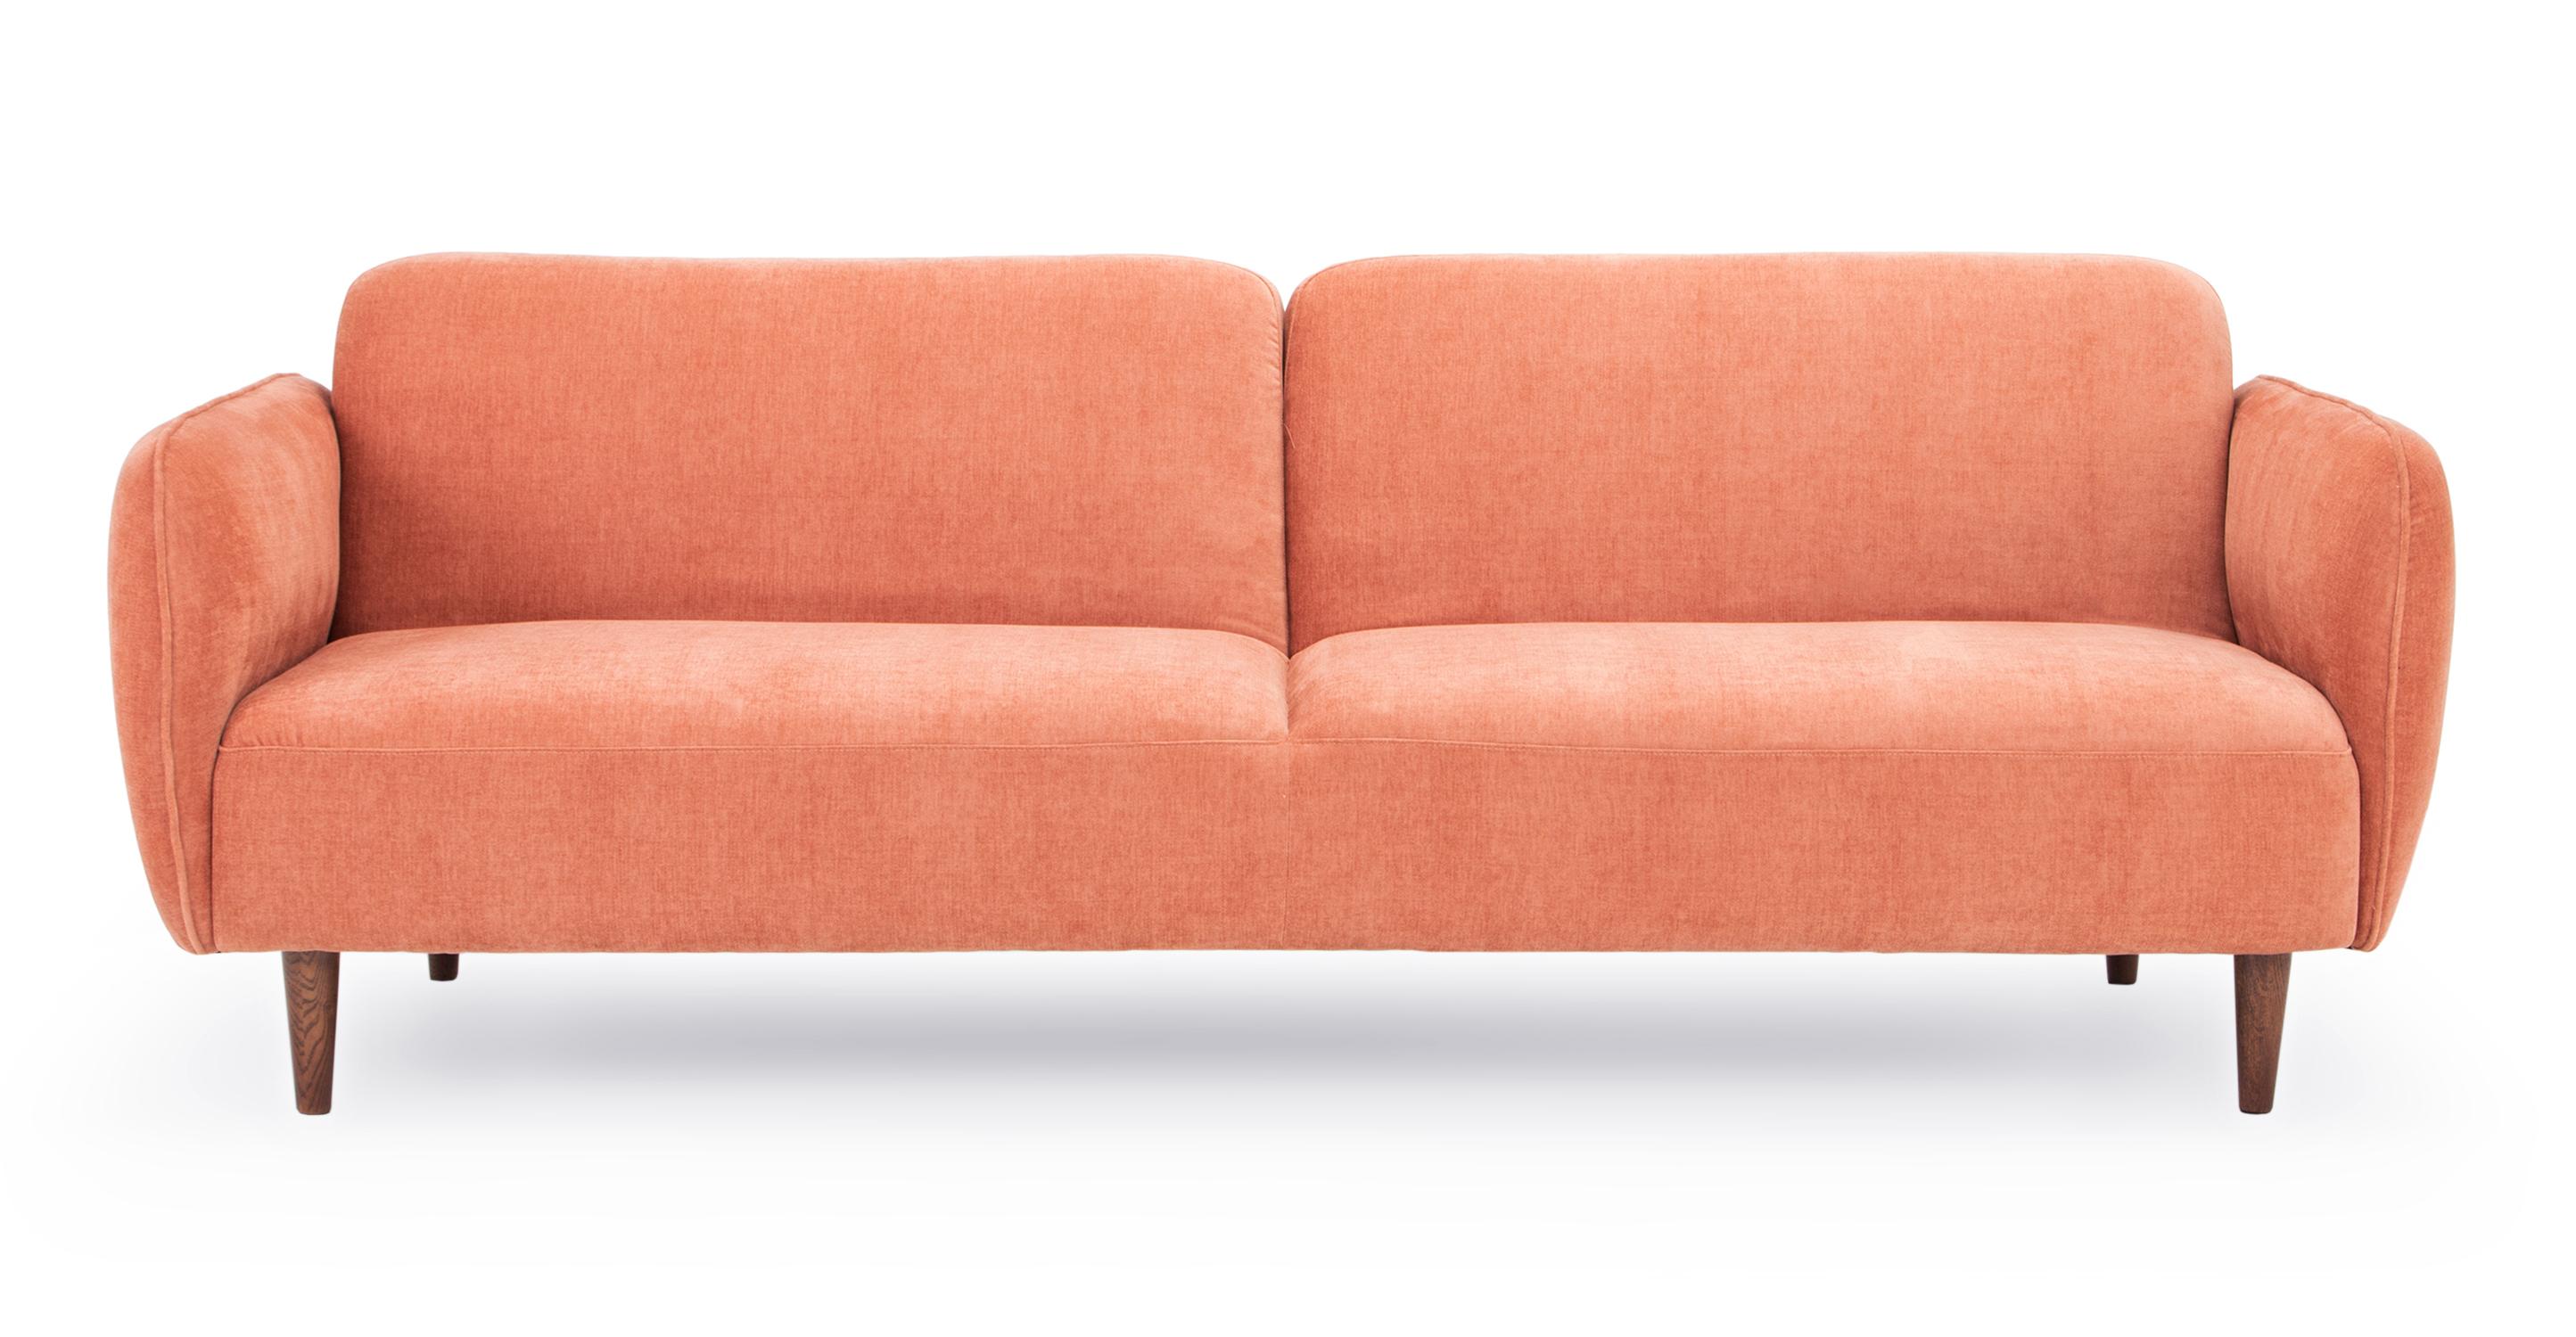 "Omer 88"" Fabric Sofa Sleeper, Enamored"